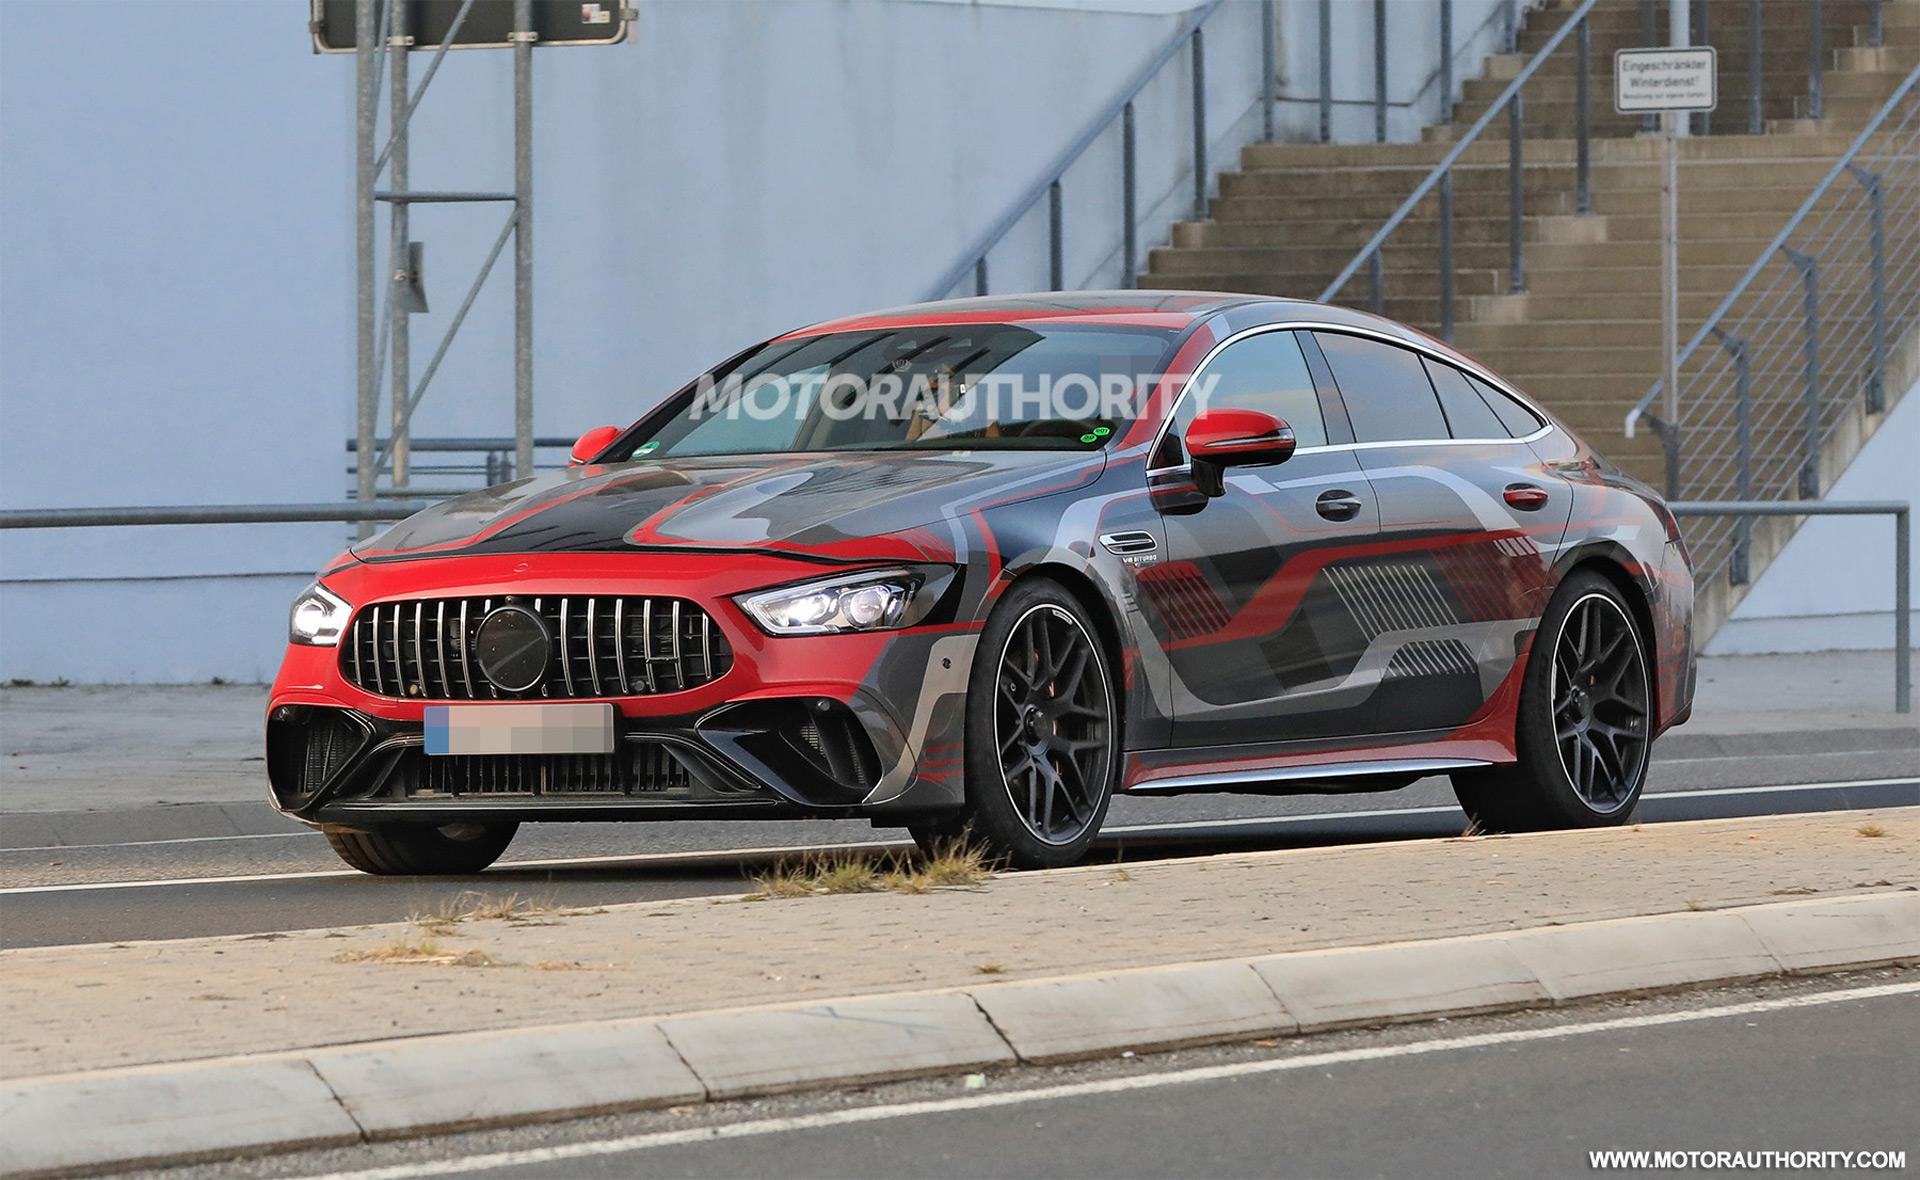 2022 Mercedes-Benz AMG GT 73e 4-Door Coupe spy shots: 800-plus-hp super hatch coming soon